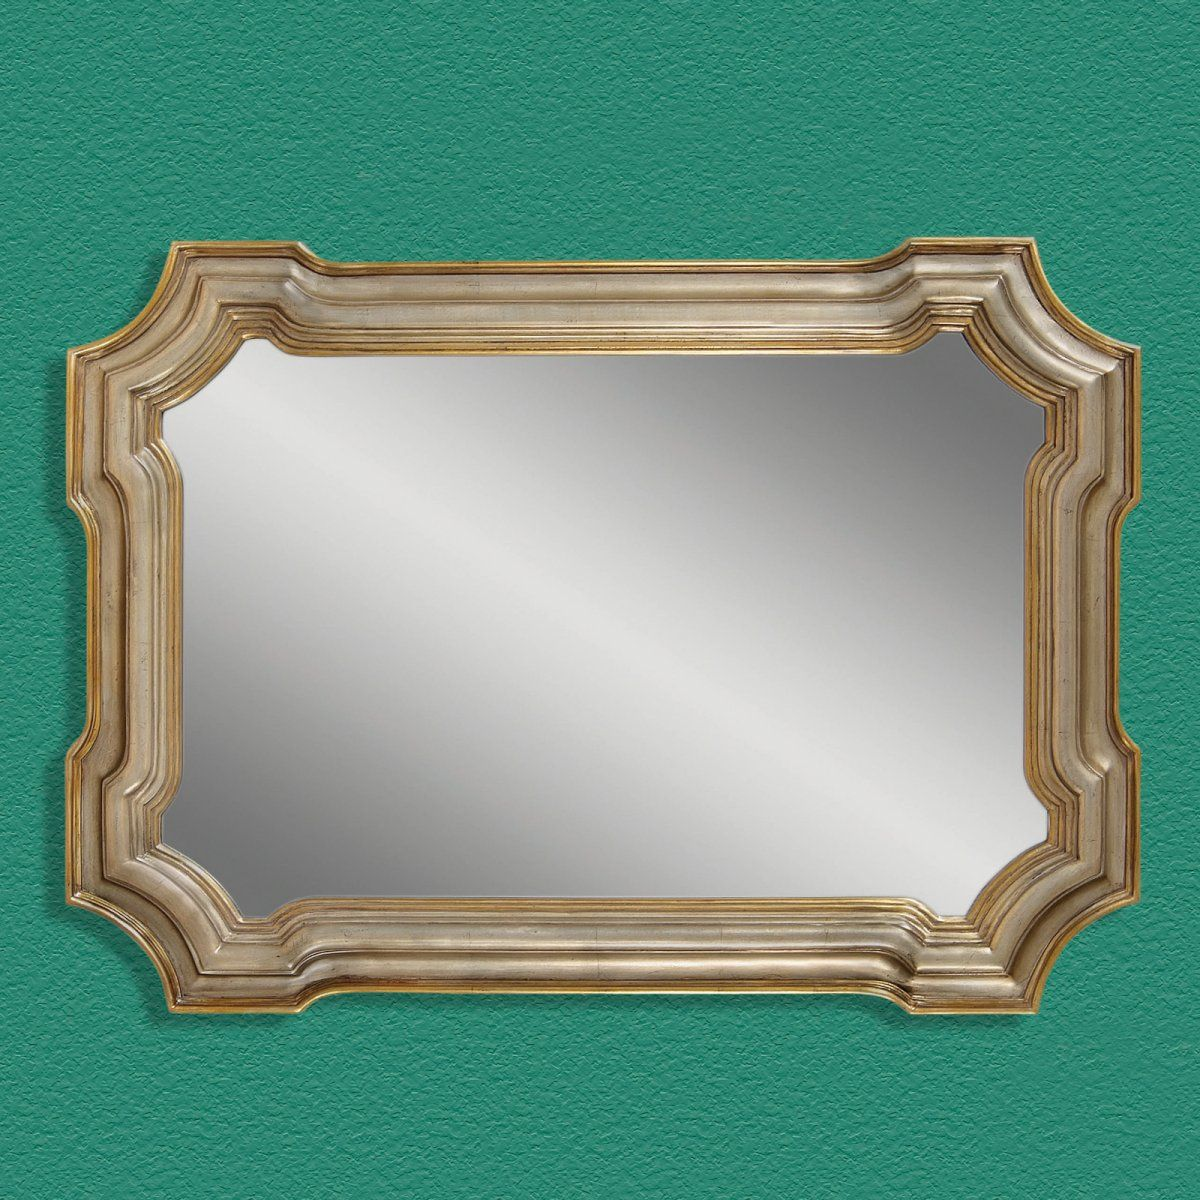 Gold & Silver Leaf Decorative Mirror - 43W x 31H in.